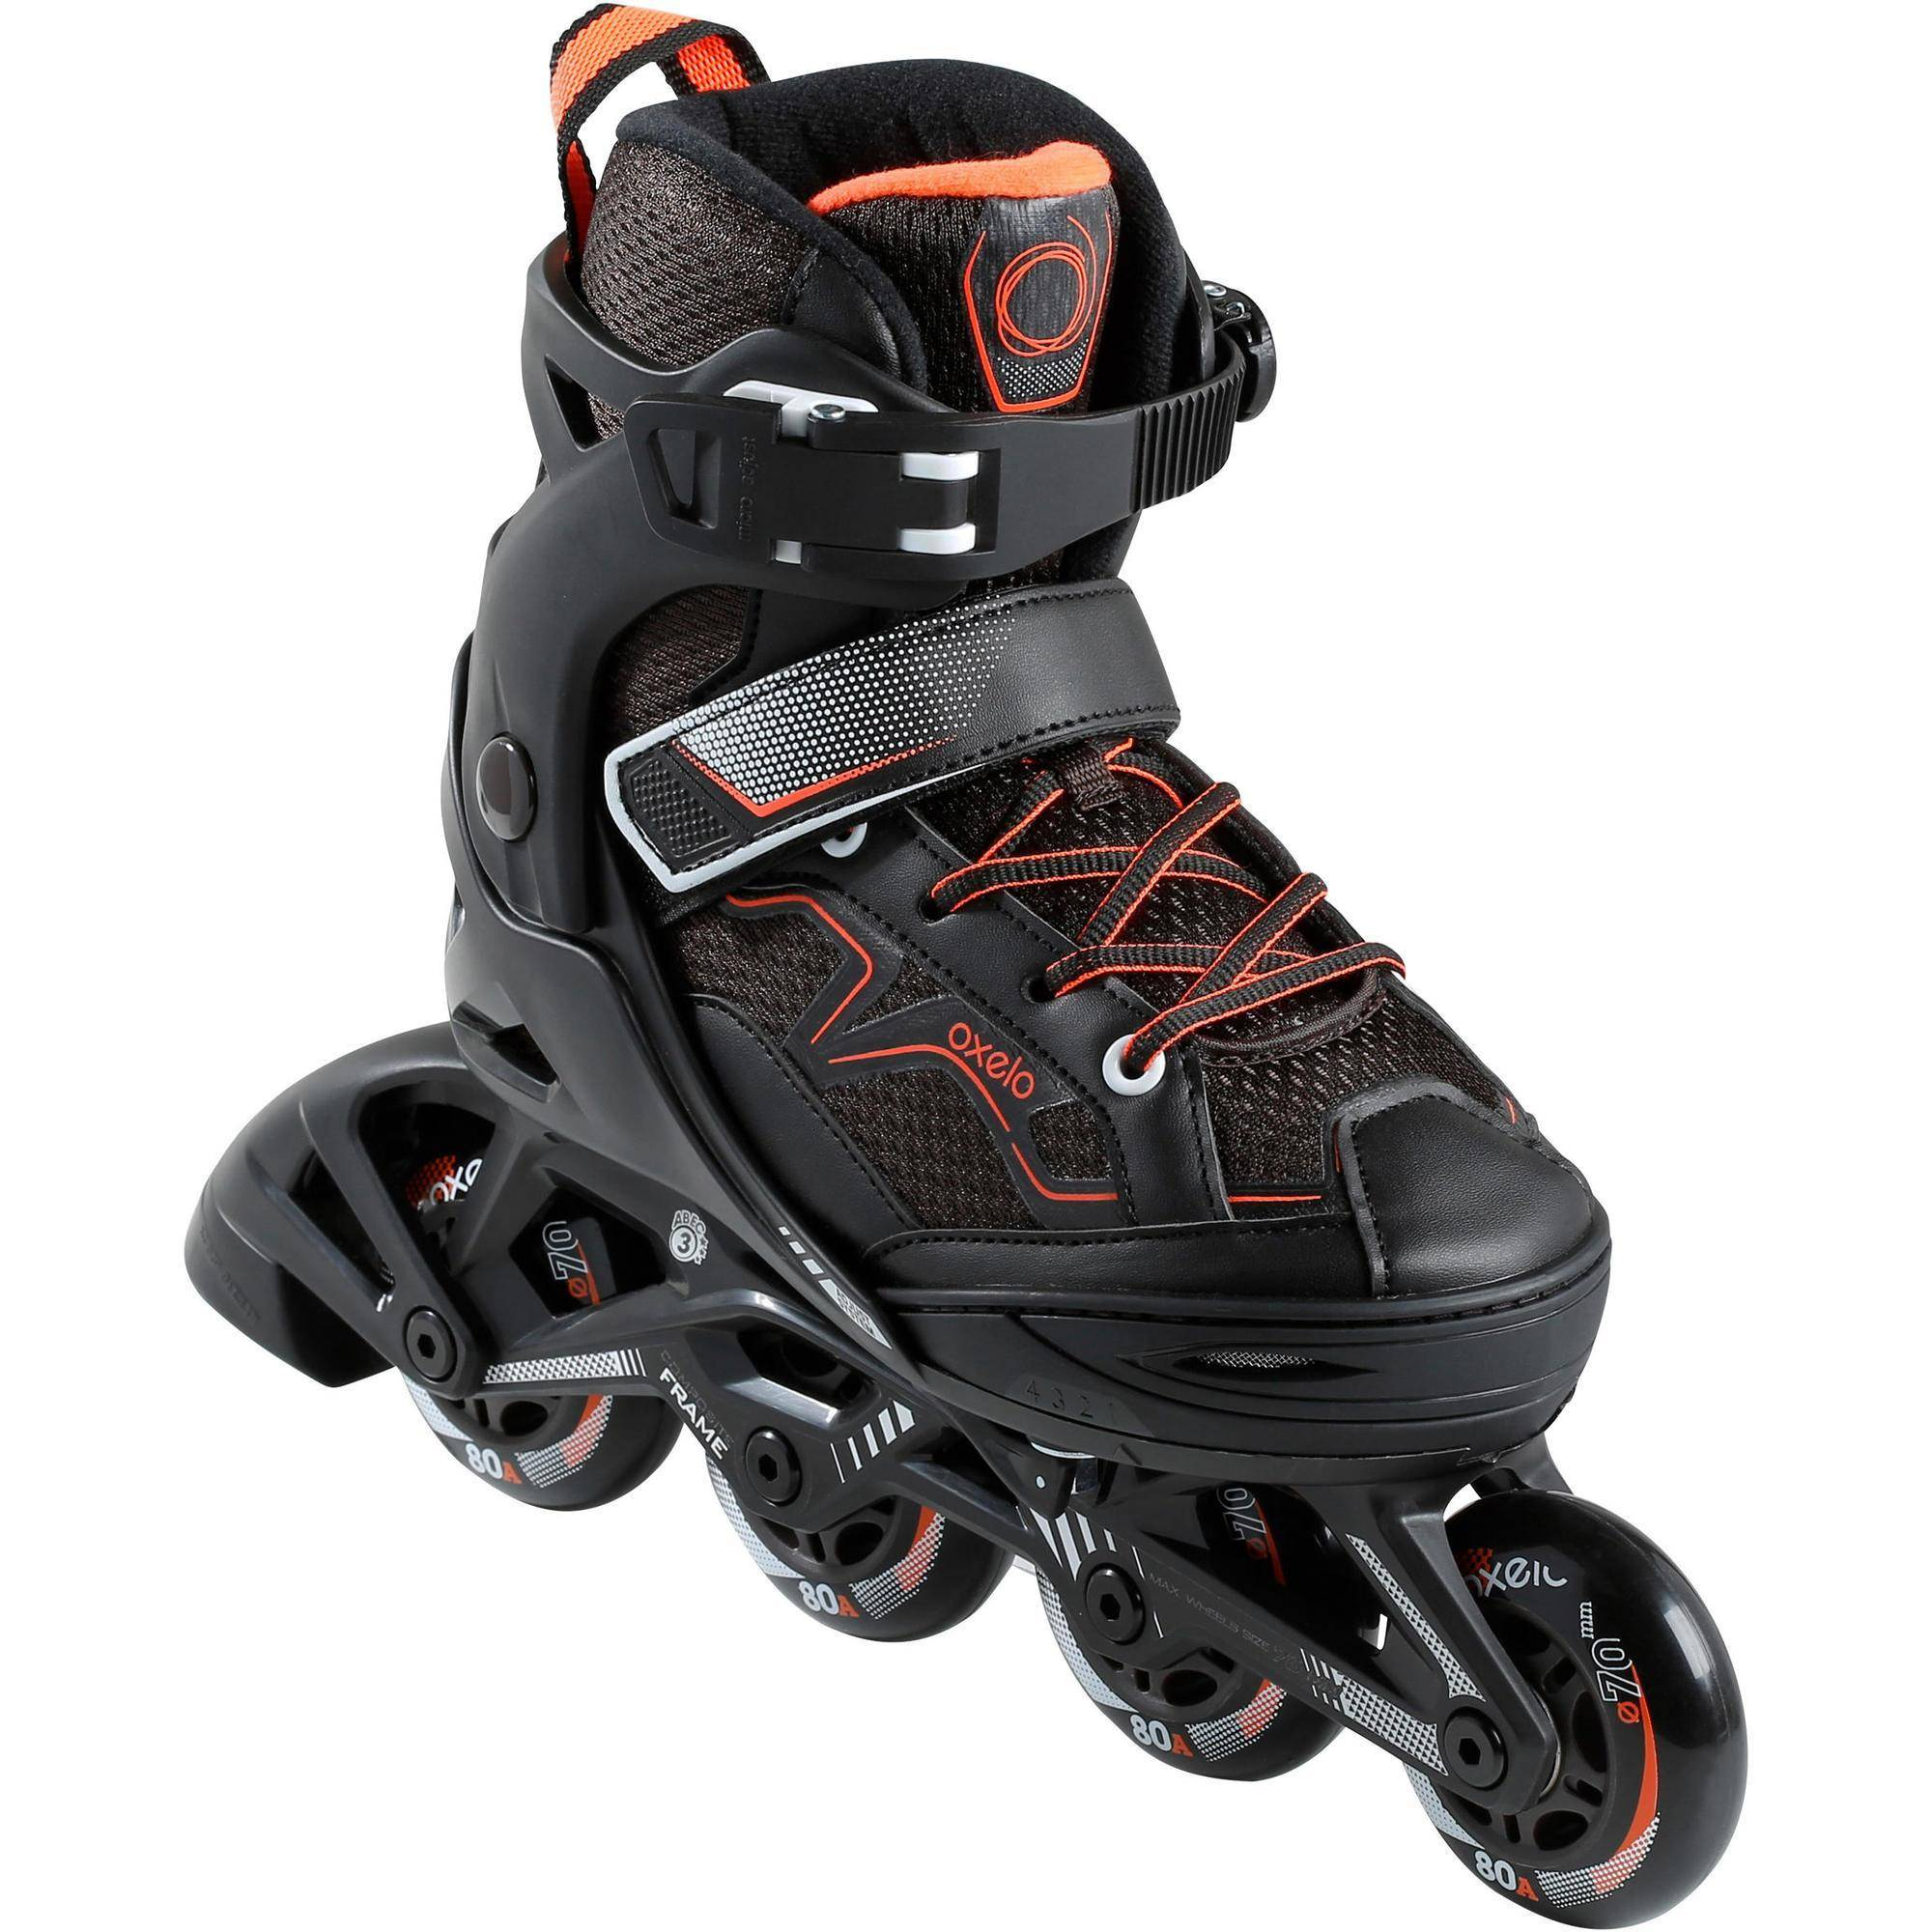 Oxelo Roller fitness enfant FIT3 JR noir orange - Oxelo